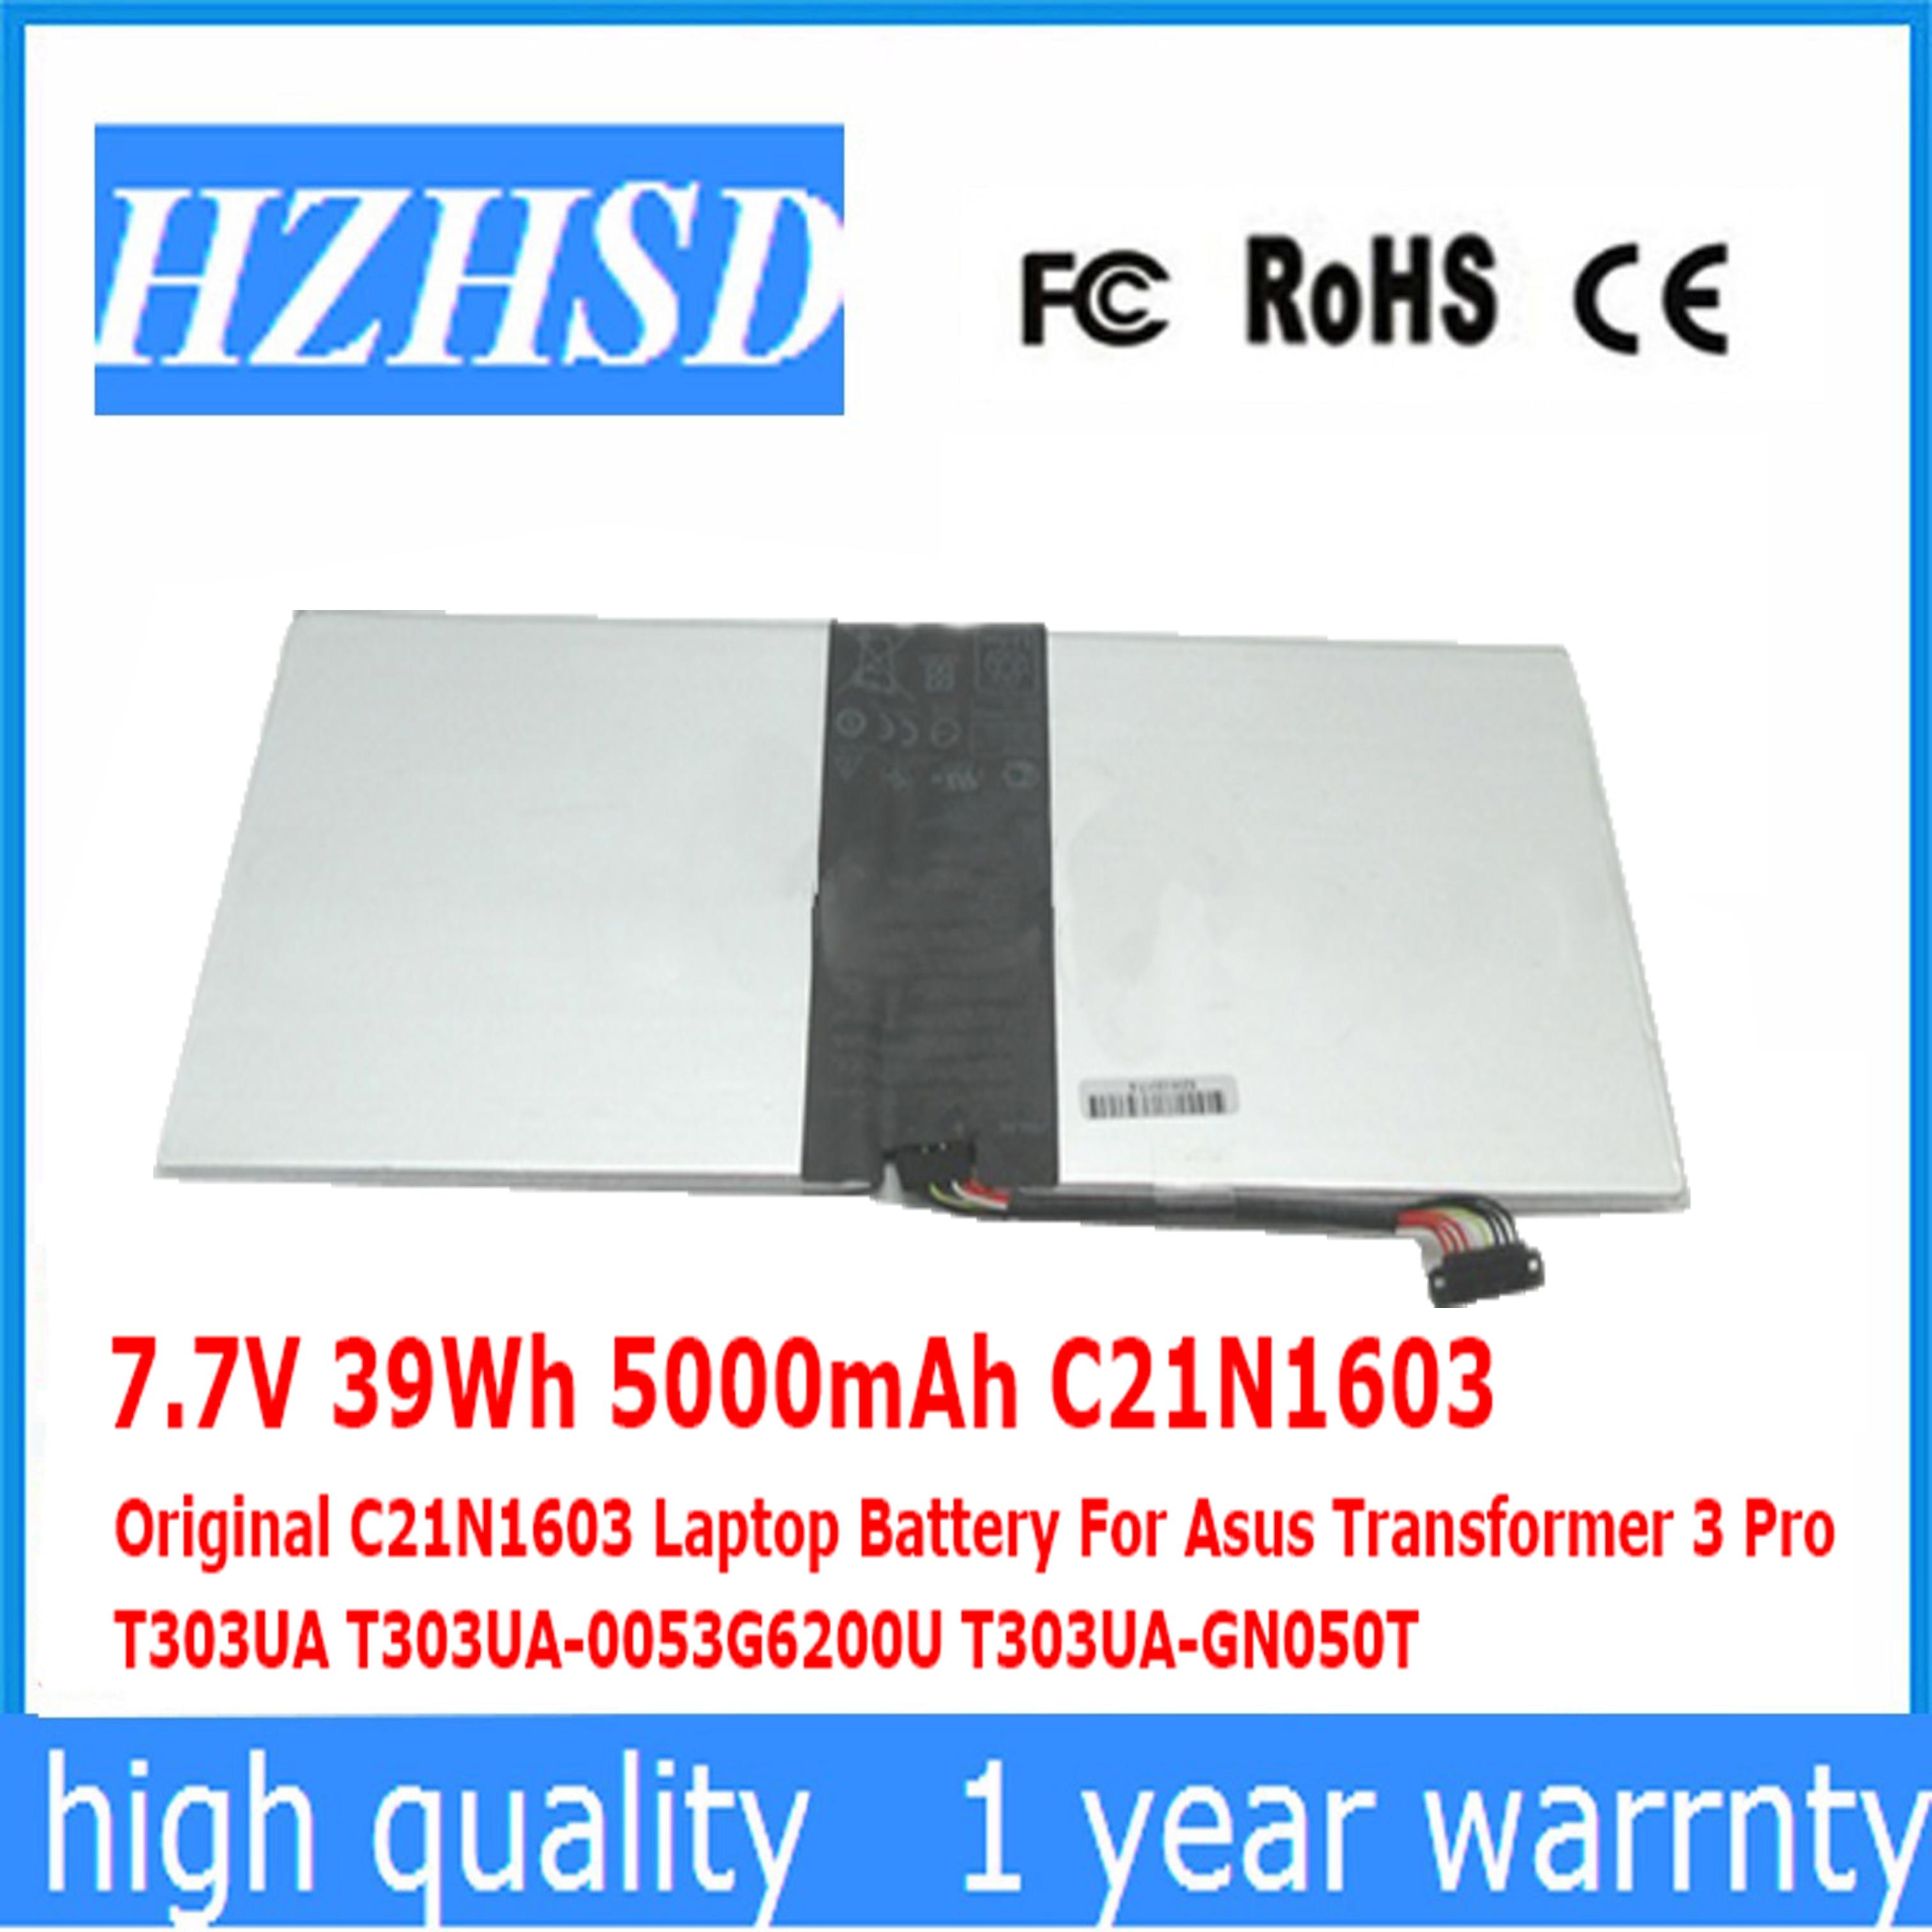 7.7V 39Wh 5000mAh C21N1603 الأصلي C21N1603 بطارية كمبيوتر محمول ل Asus محول 3 برو T303UA T303UA-0053G6200U T303UA-GN050T